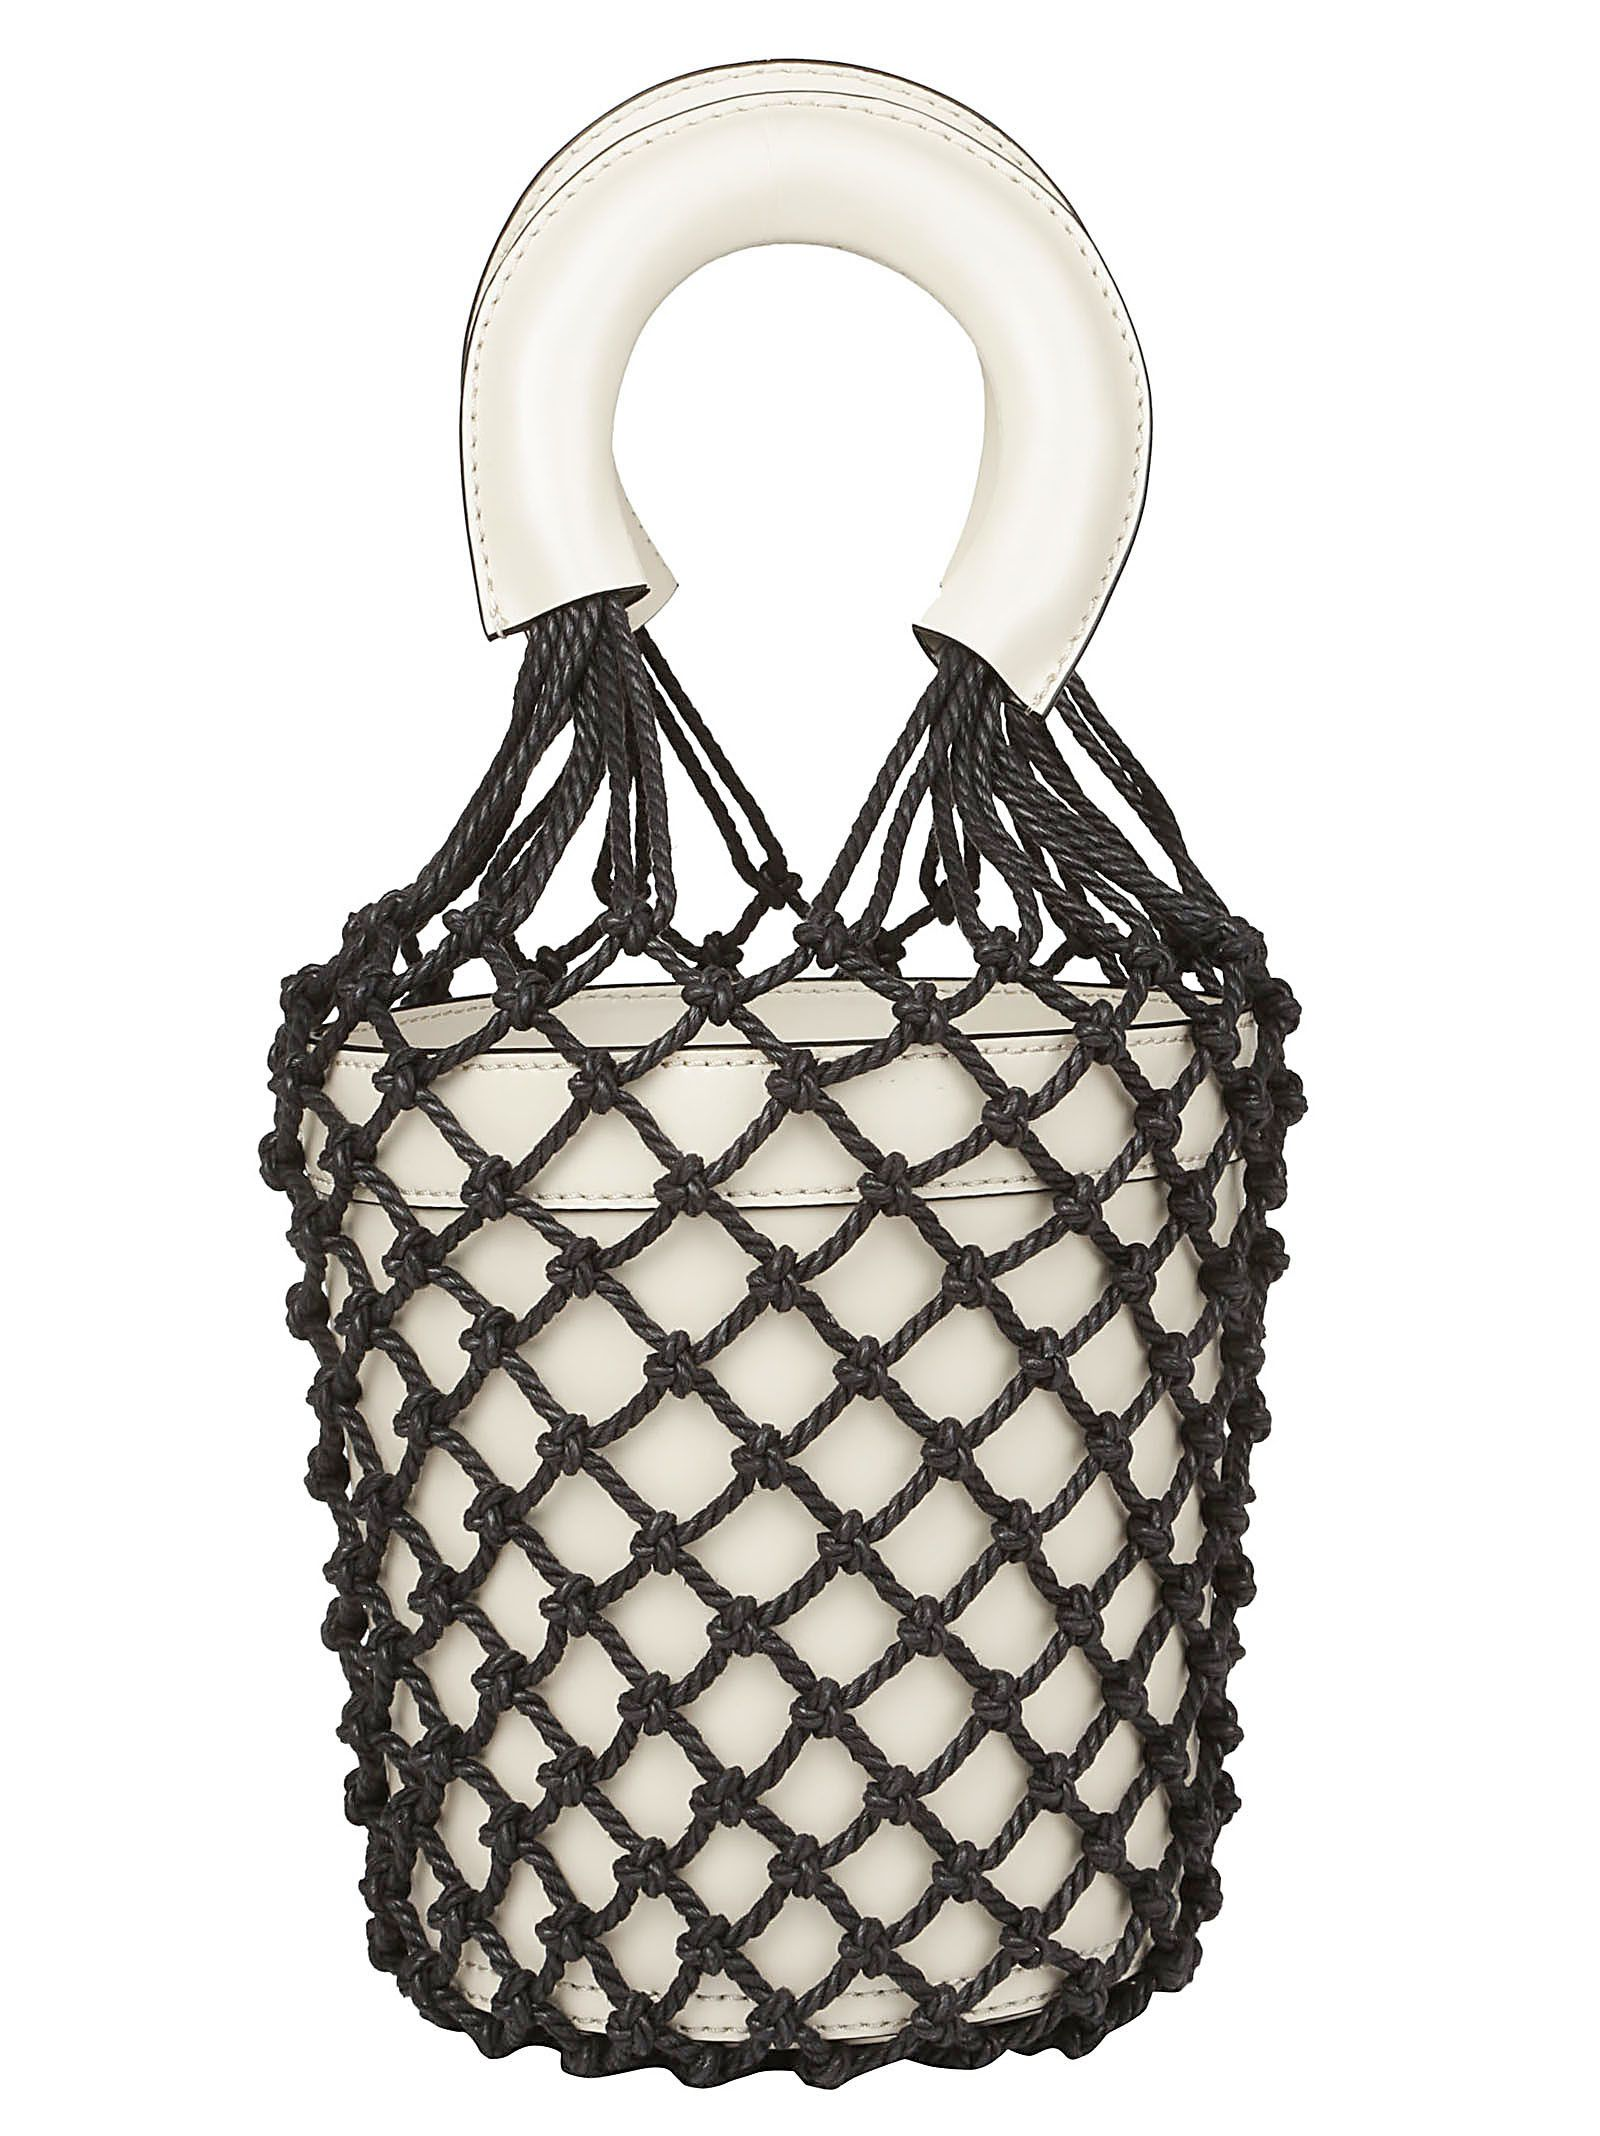 Moreau Italist Creamblack Staud Handbag 10838583 qxP4Faw